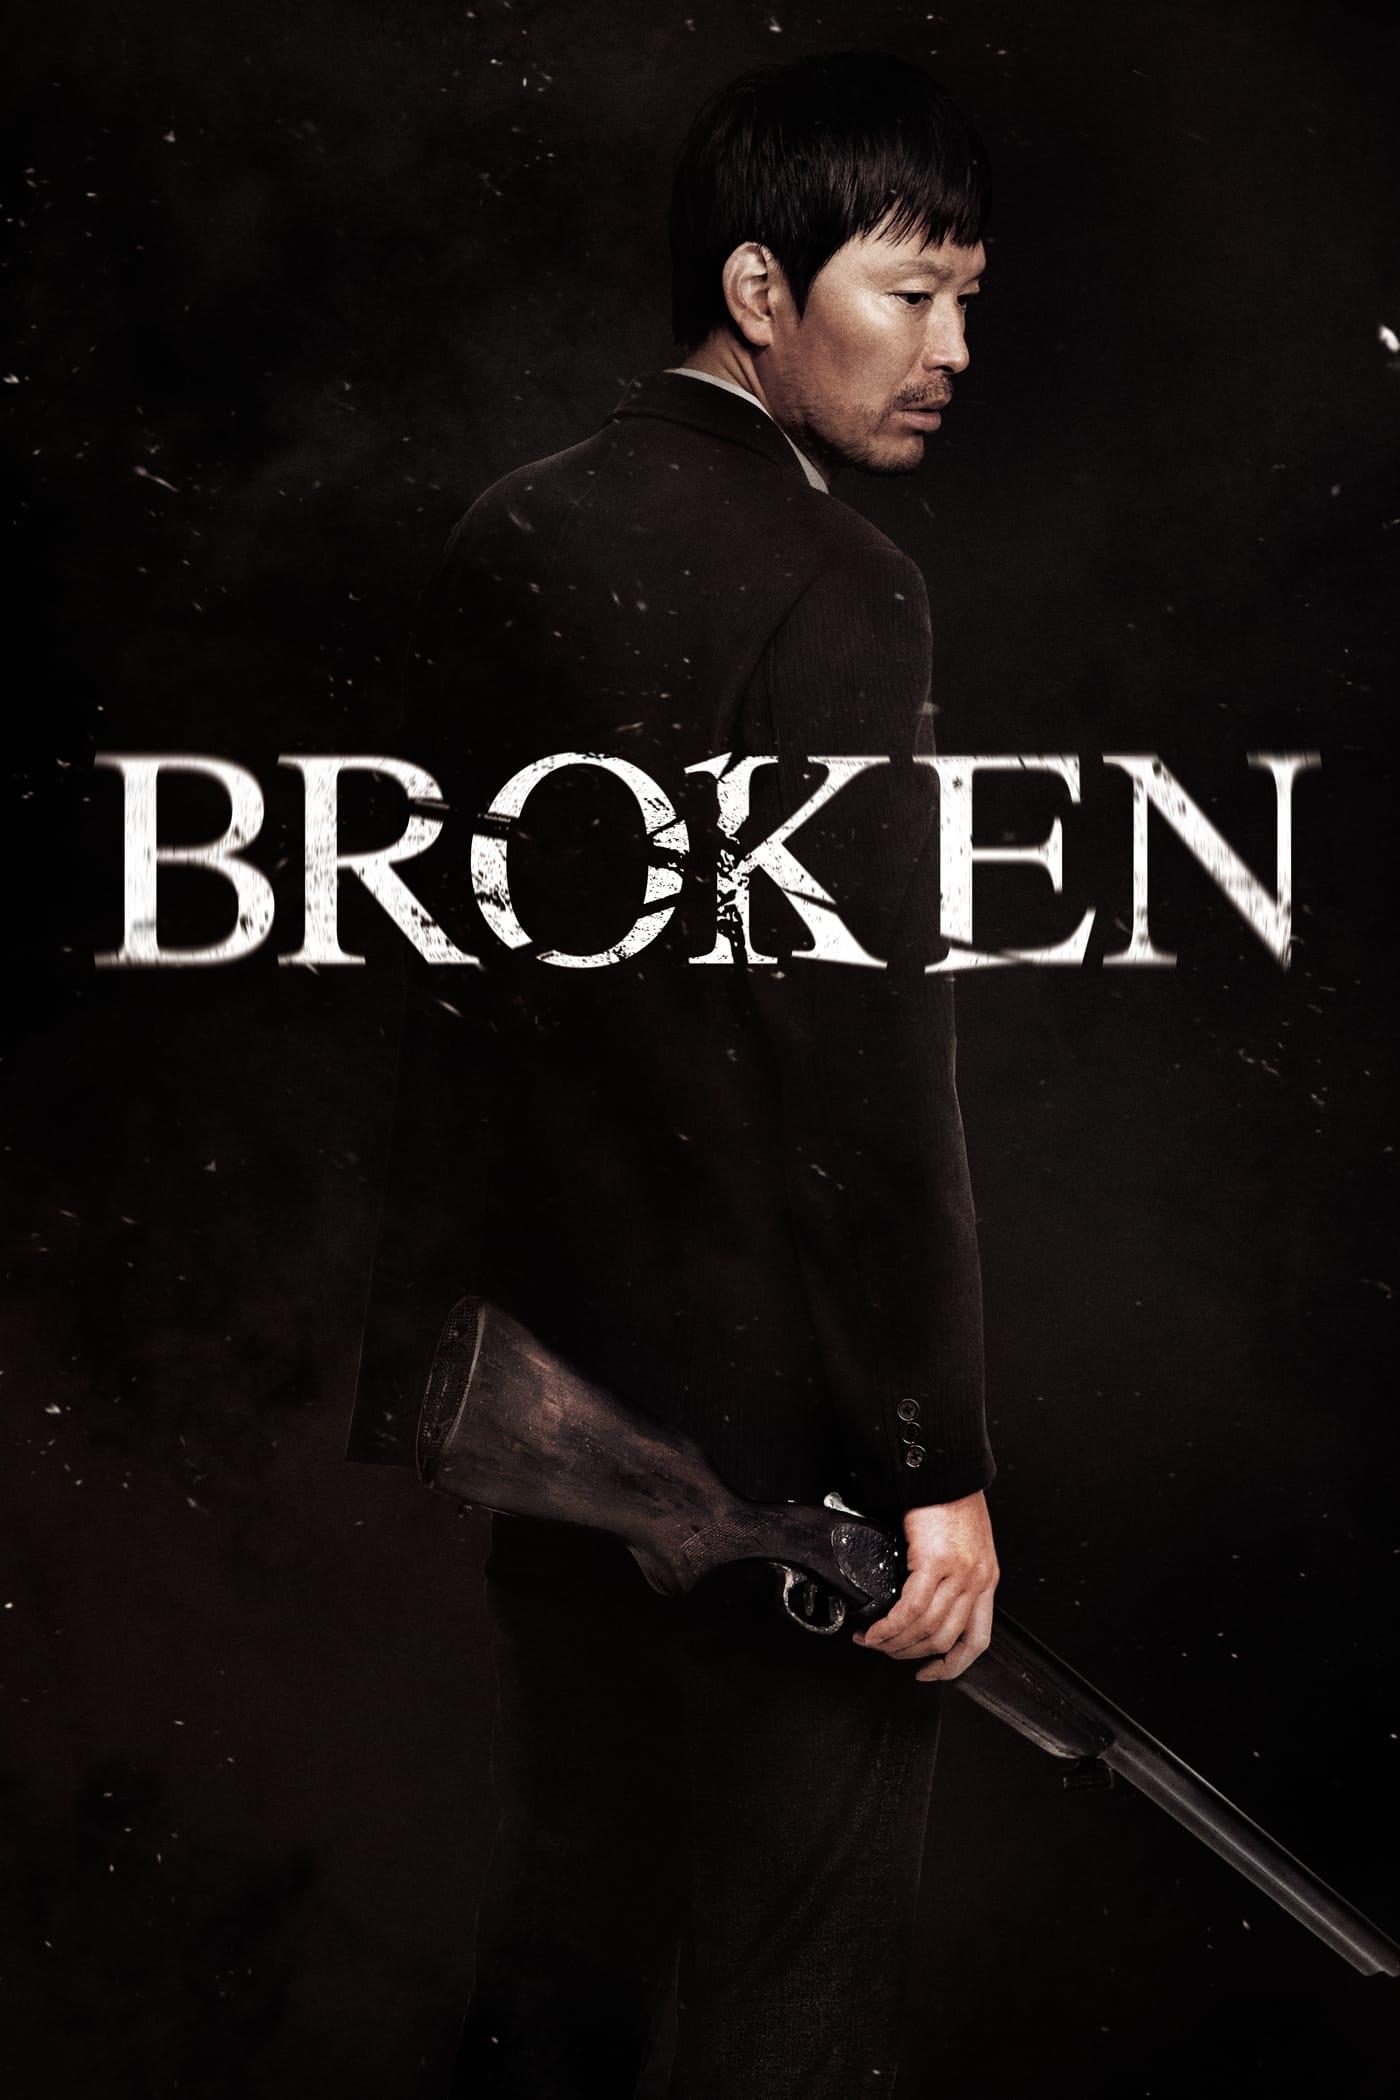 The Hovering Blade (Broken)